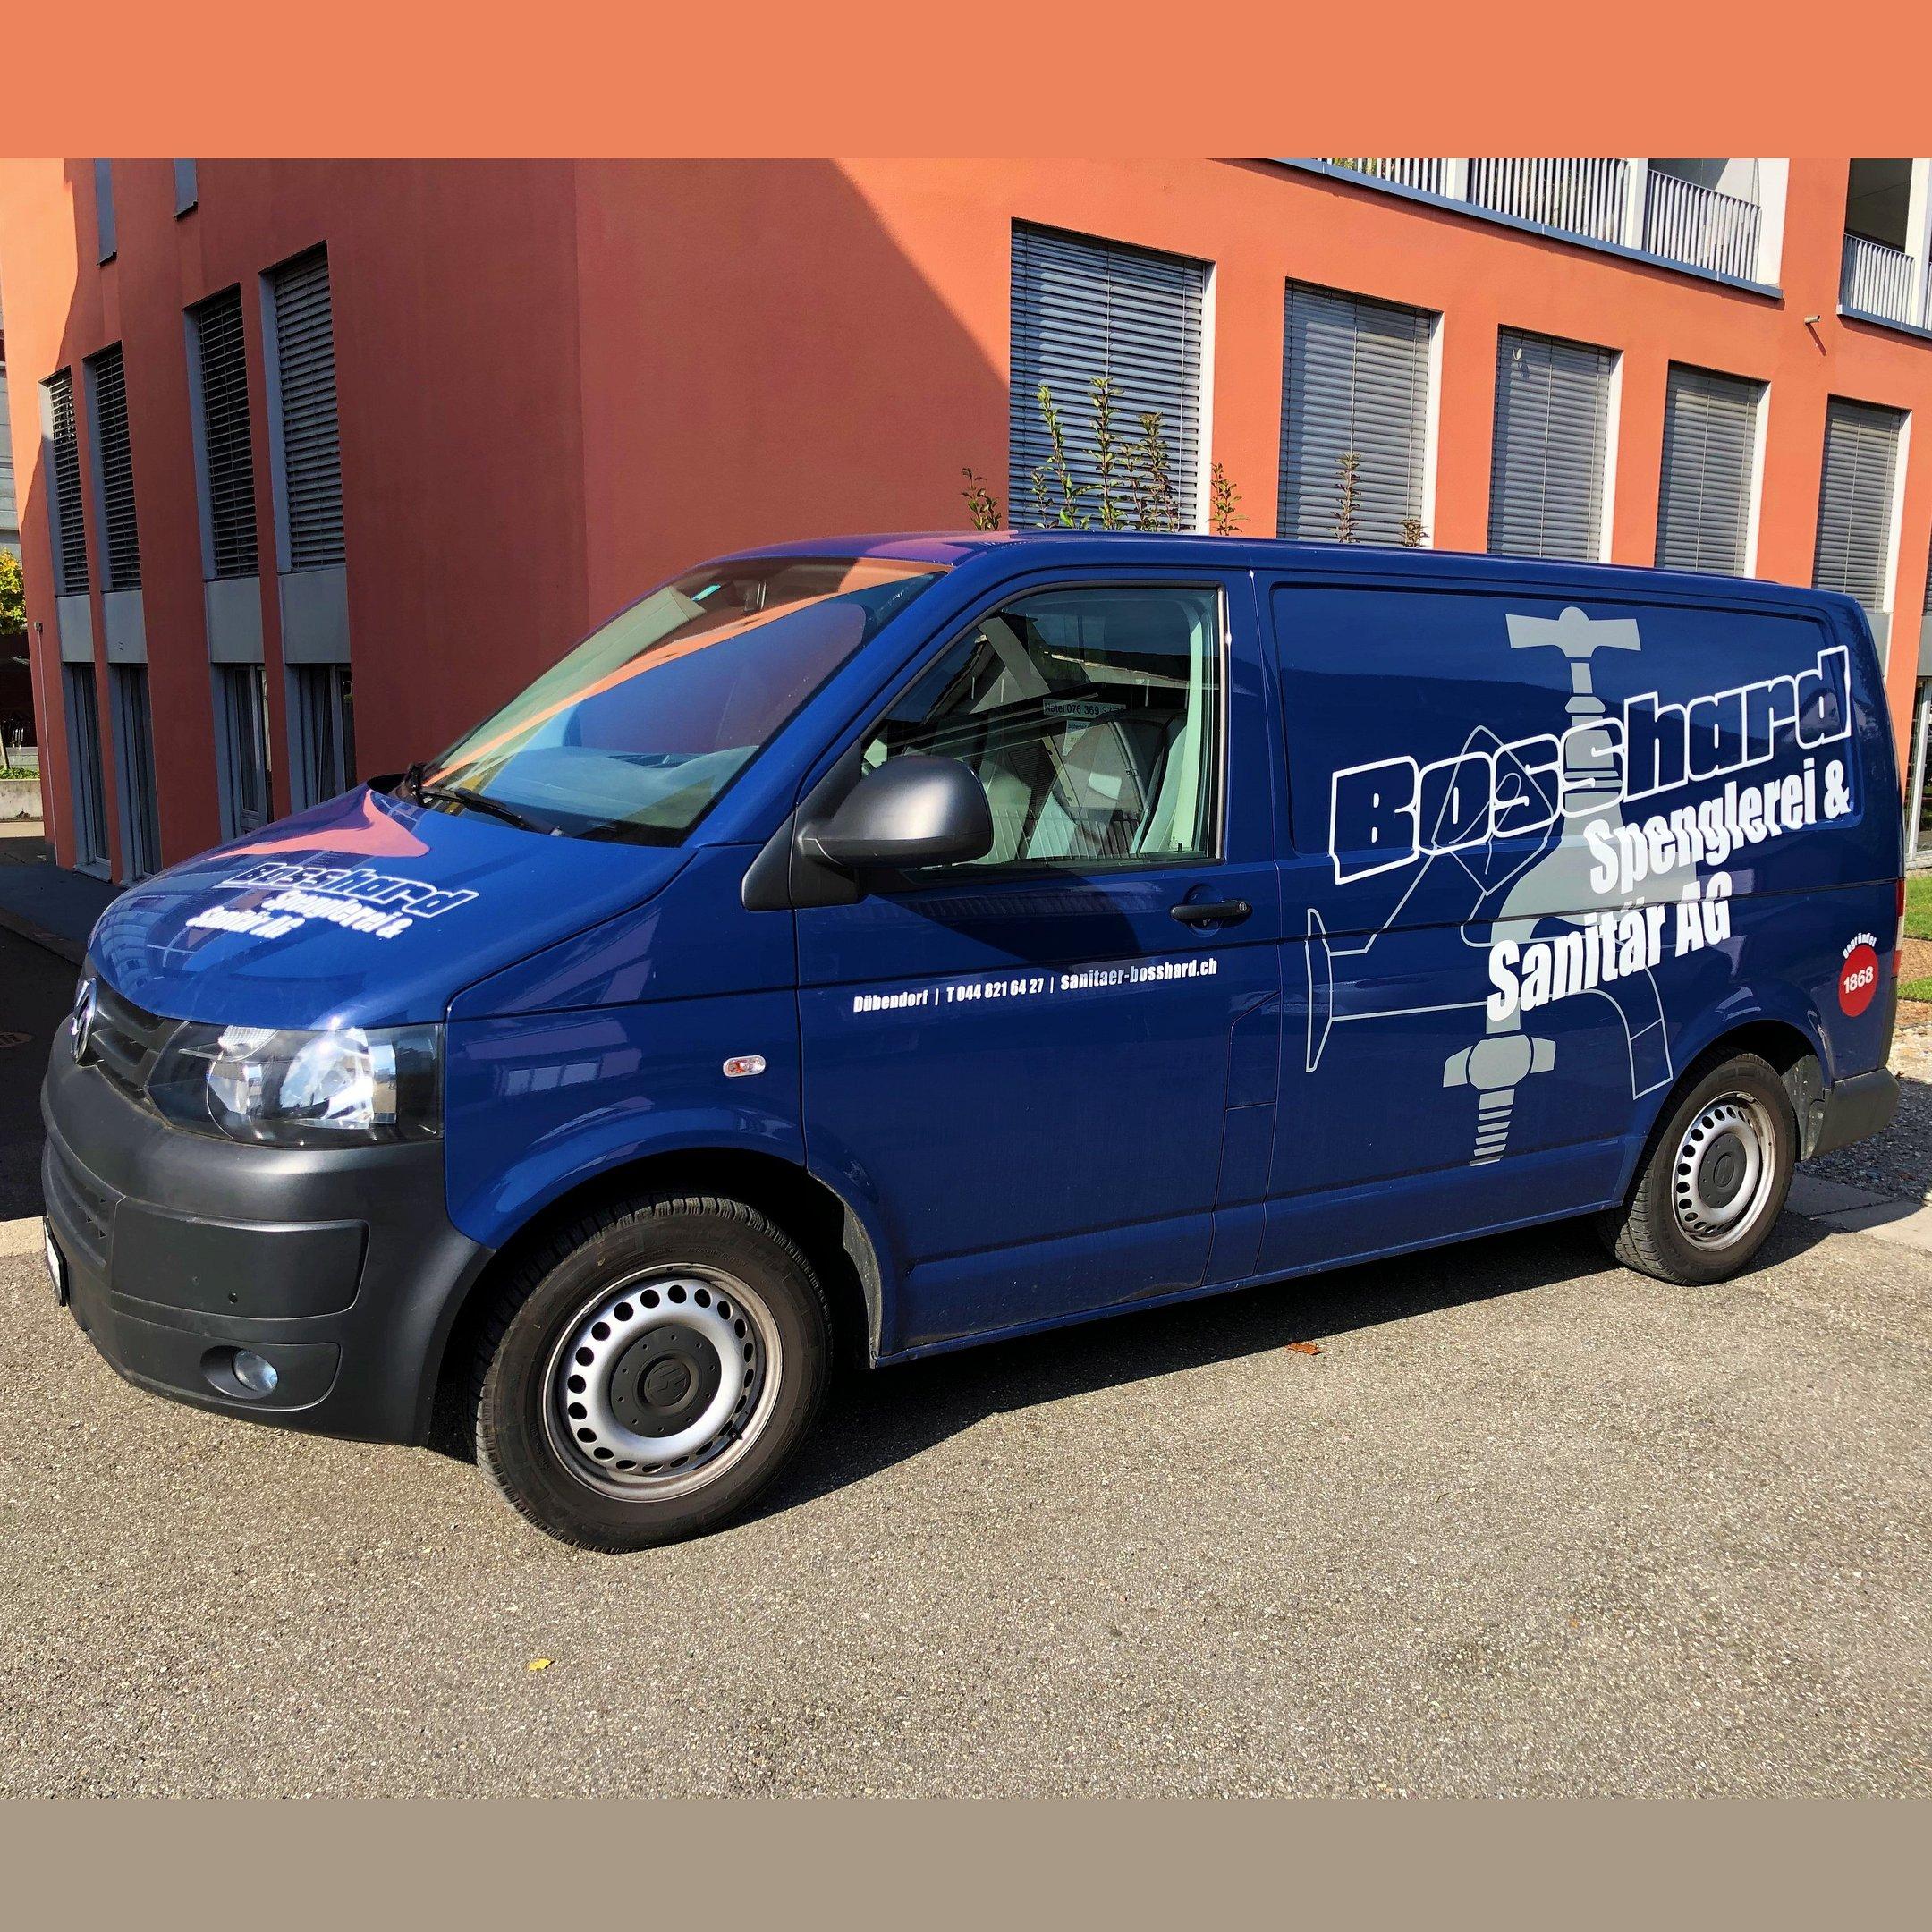 Bosshard Spenglerei & Sanitär AG